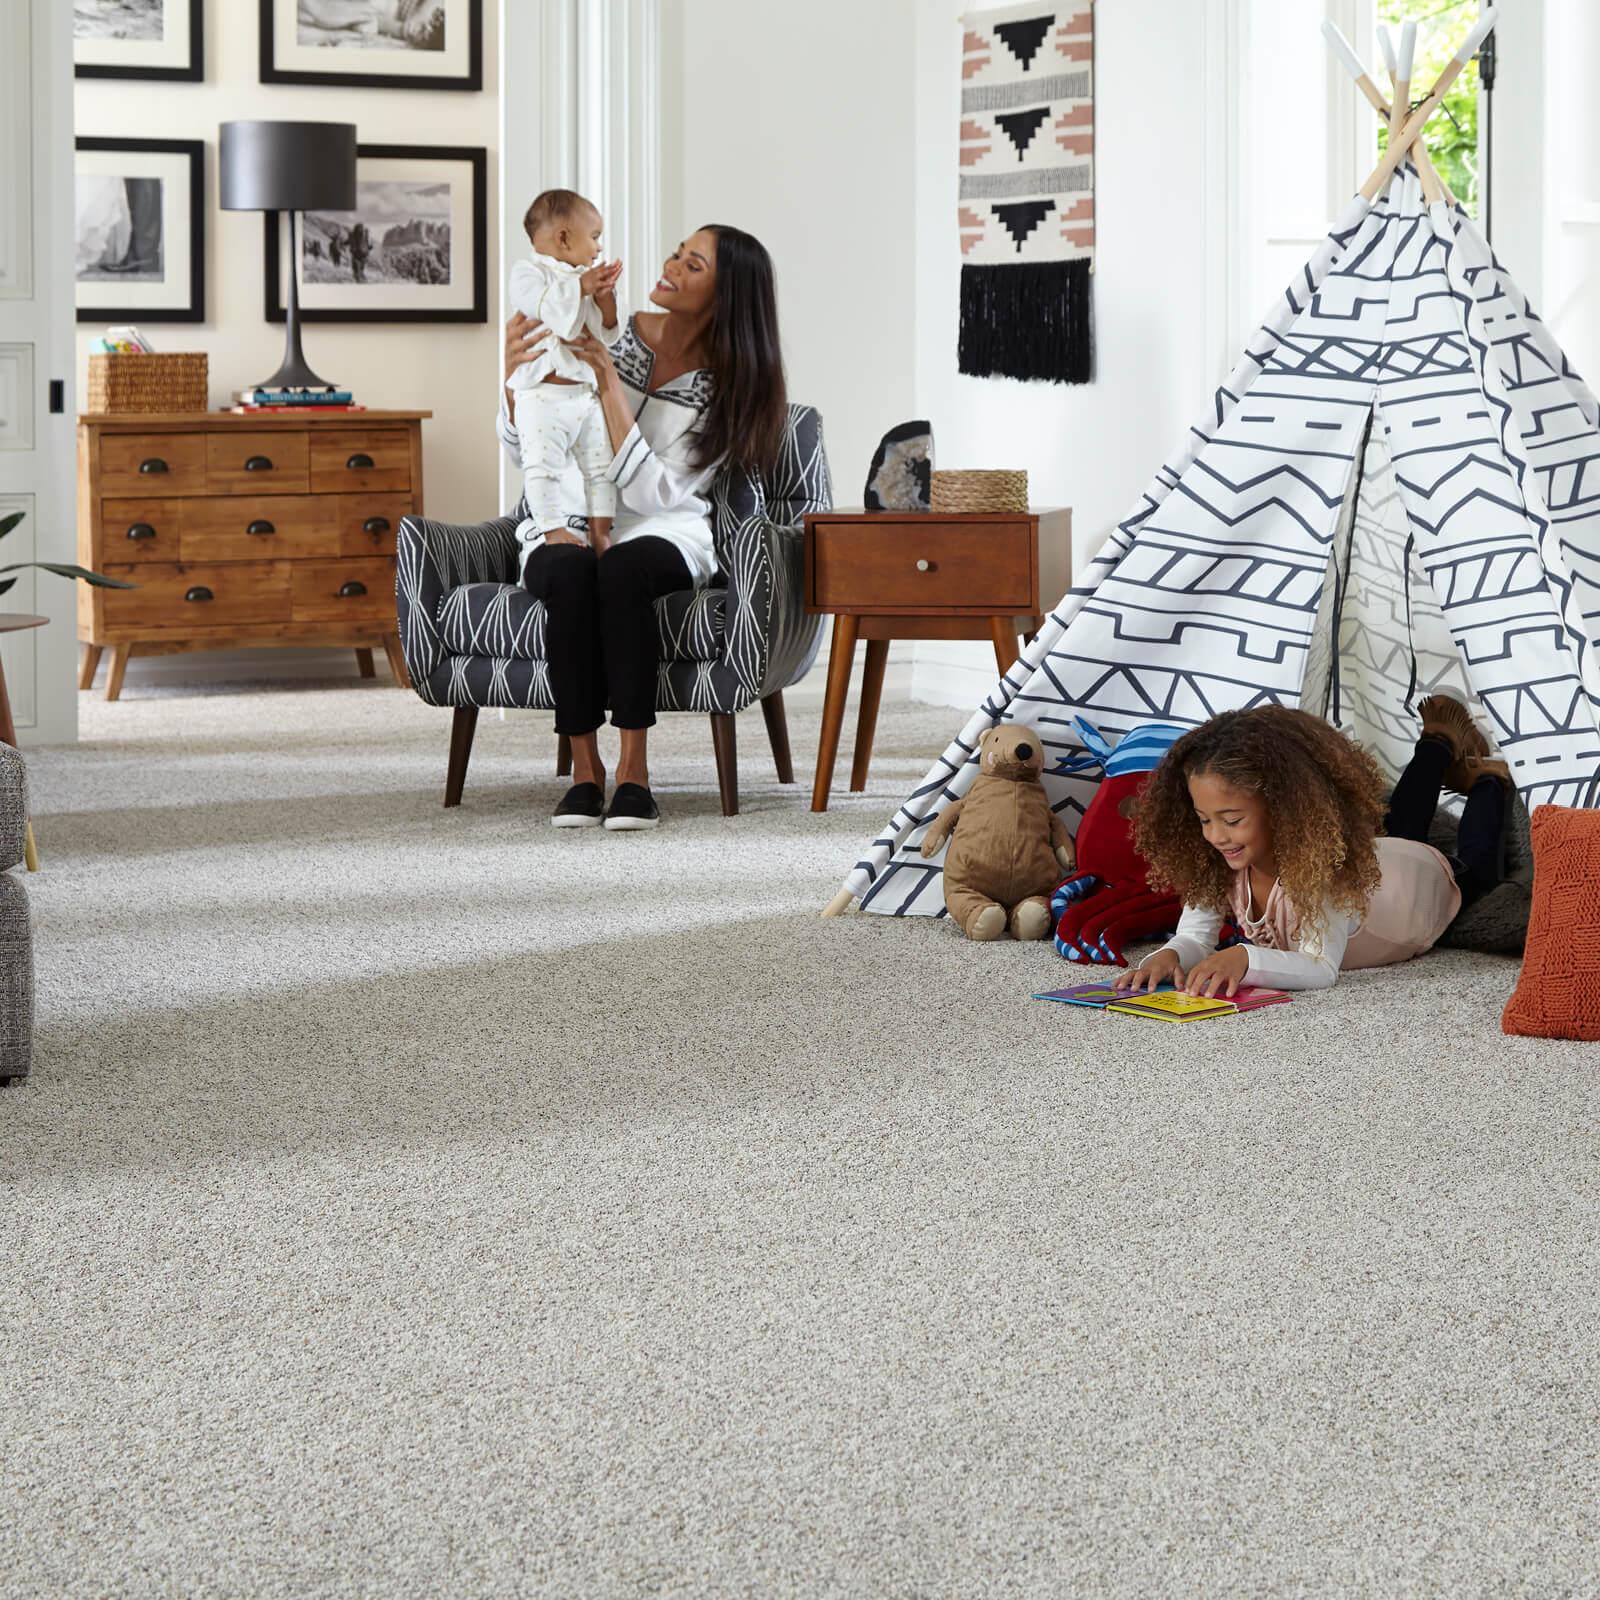 Carpeting in Living Room   Haley's Flooring & Interiors